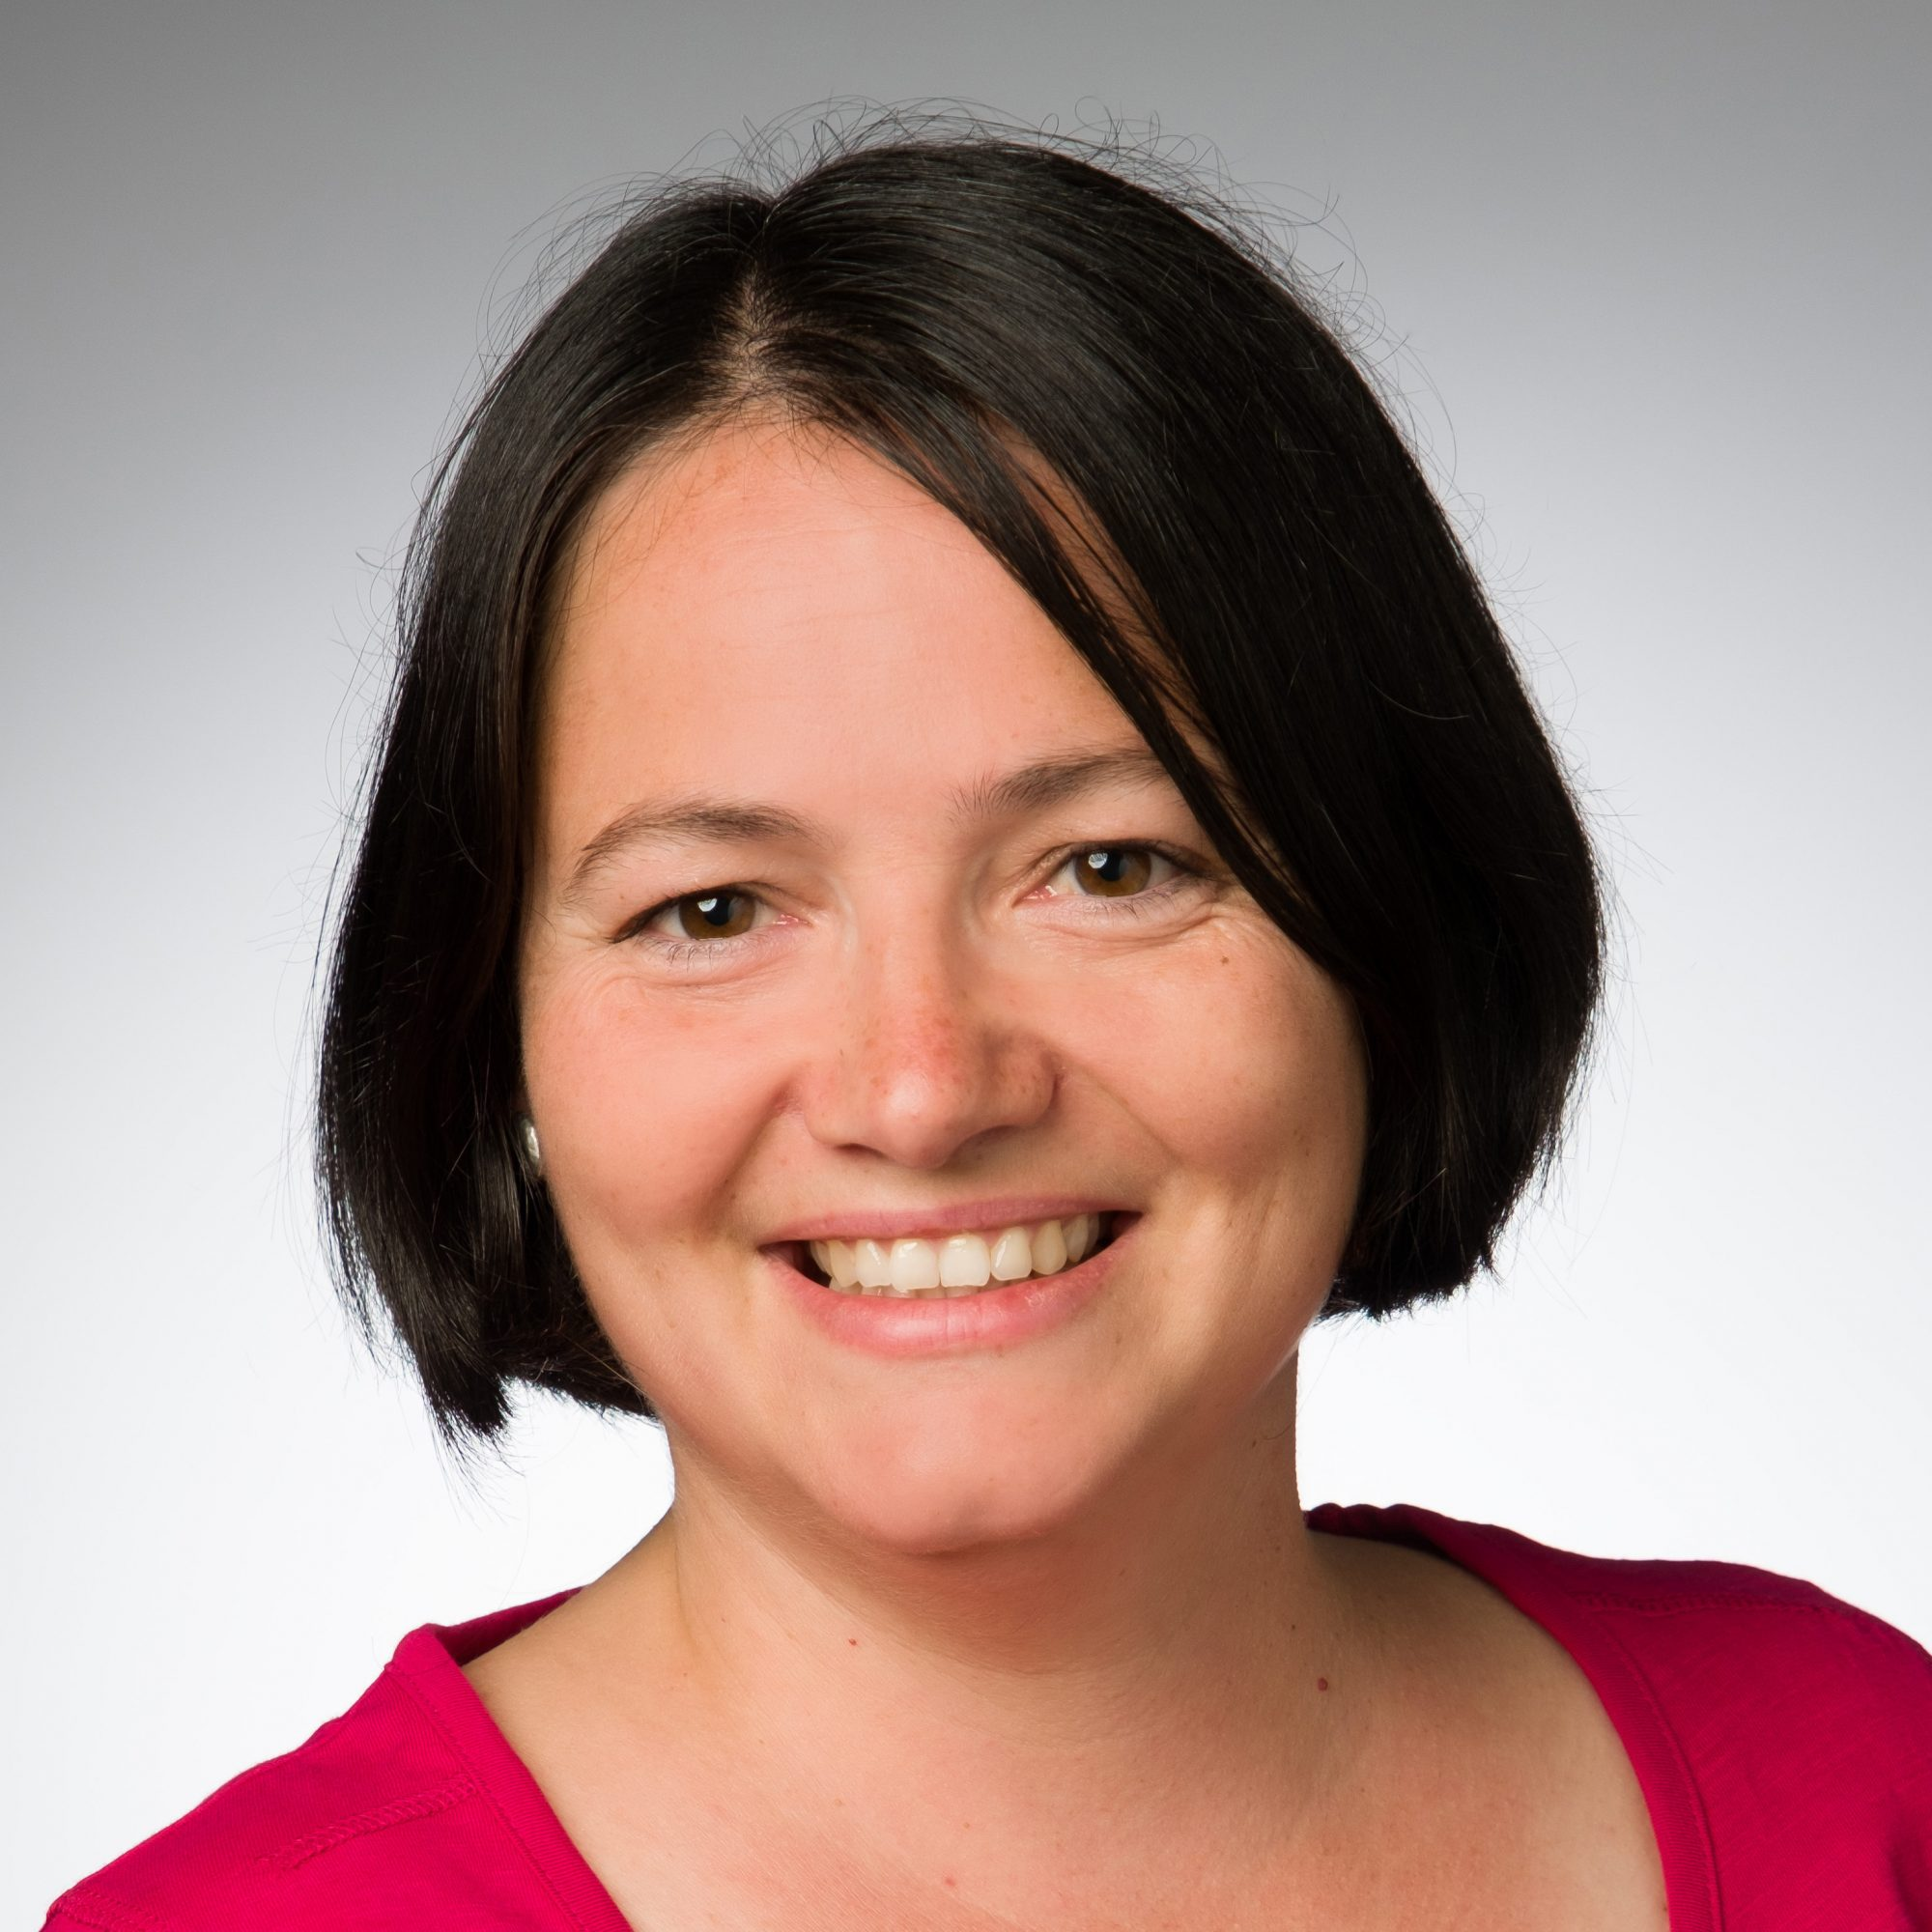 Dr. Katrin Schretter